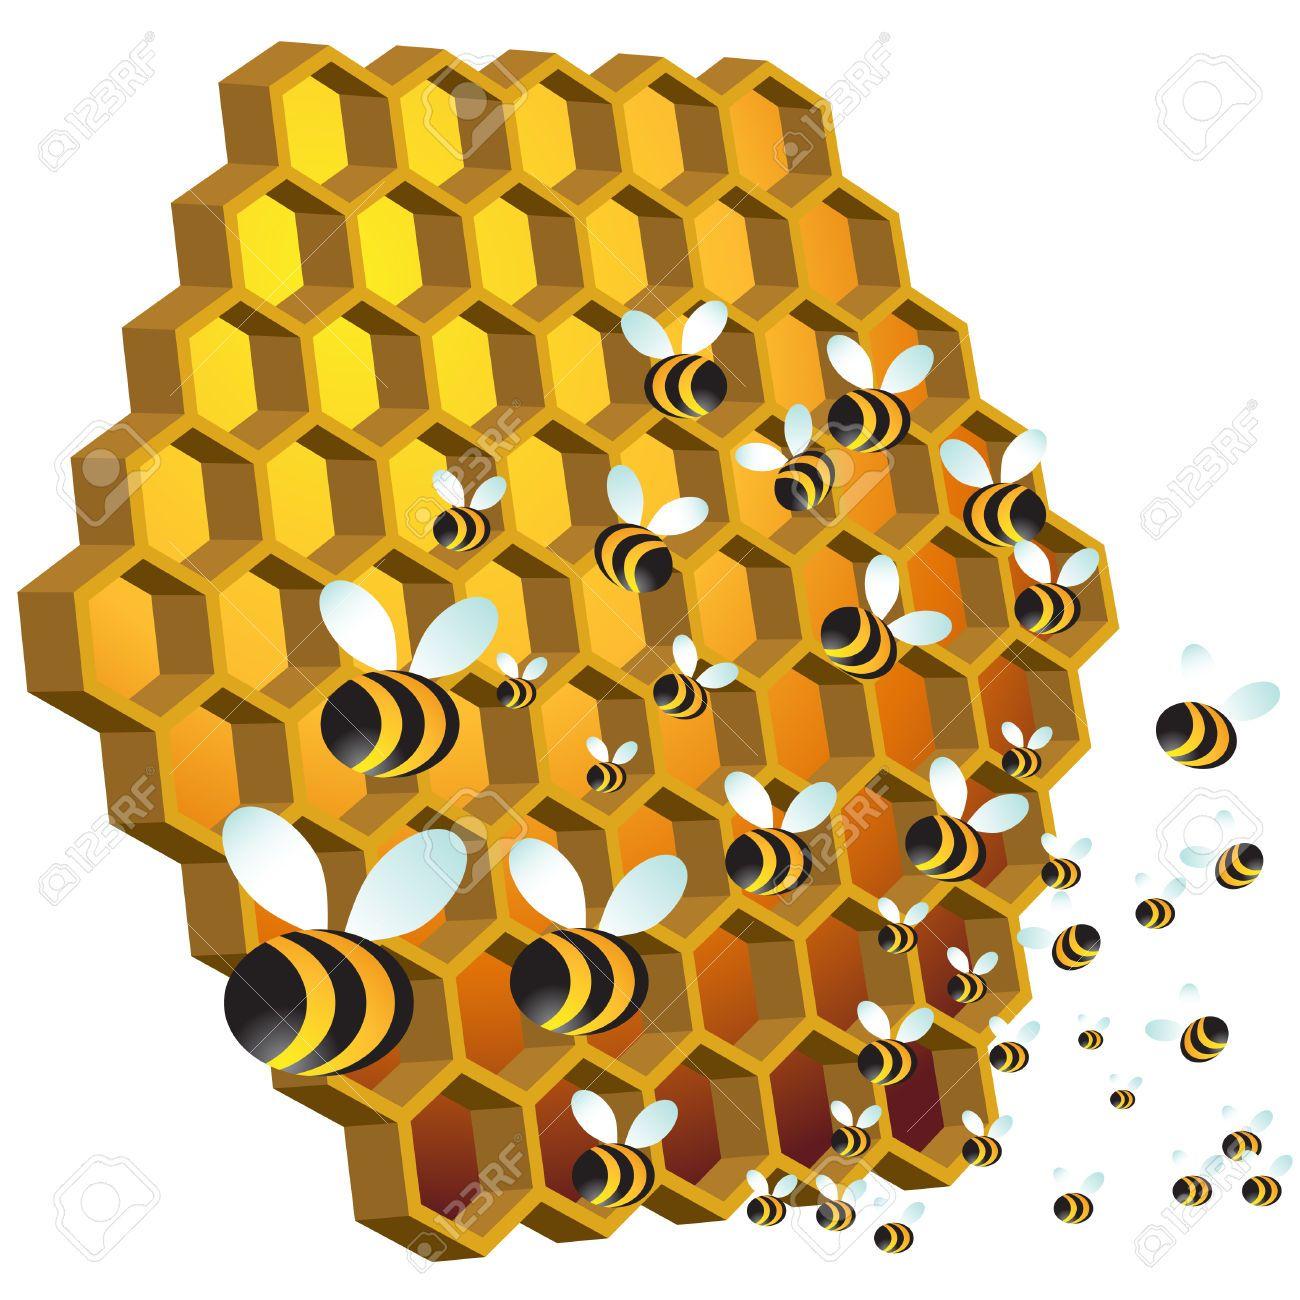 Hive pea s . Bees clipart honey bee